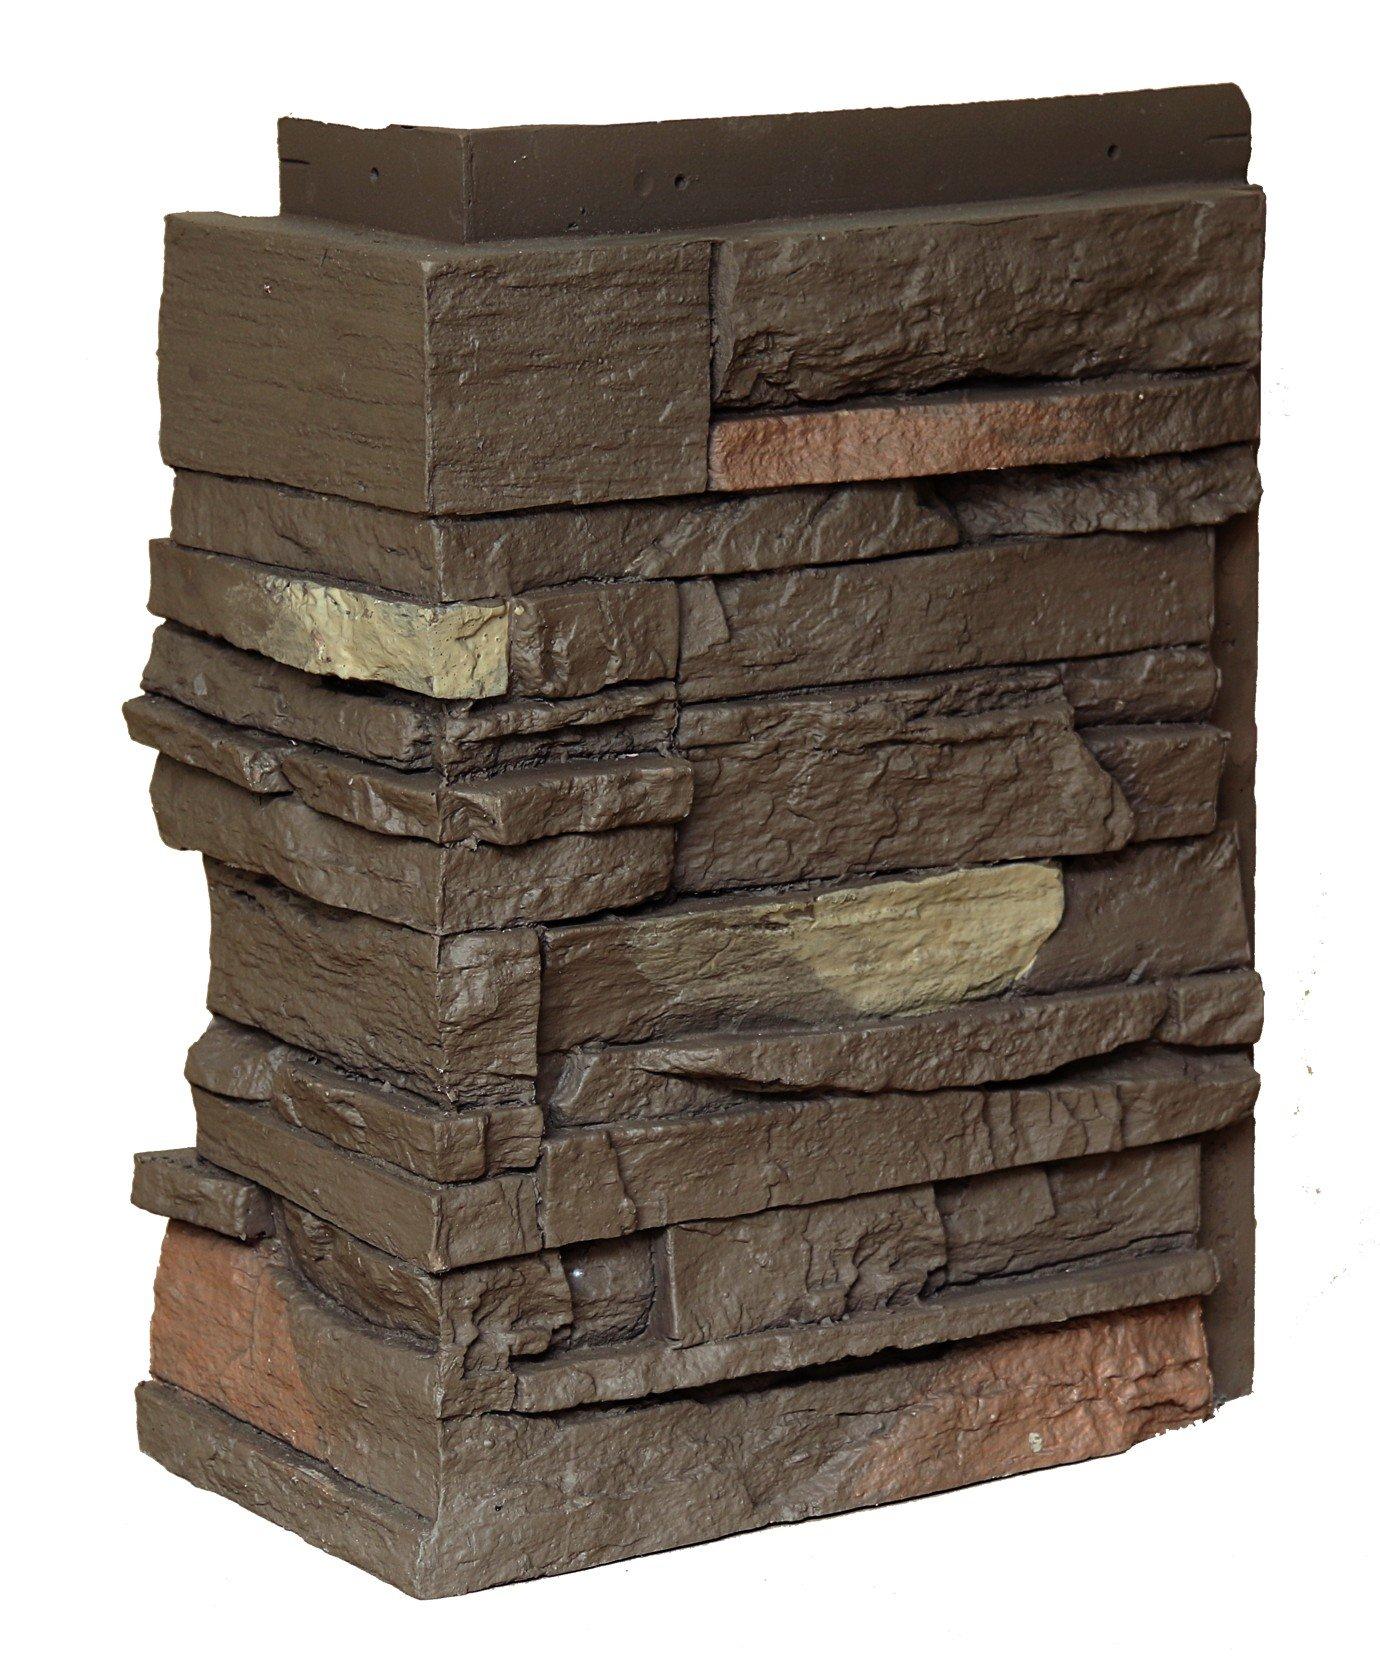 NextStone Country Ledgestone Faux Polyurethane Stone Outside Corner - Himalayan Brown - 4 Pack by NextStone